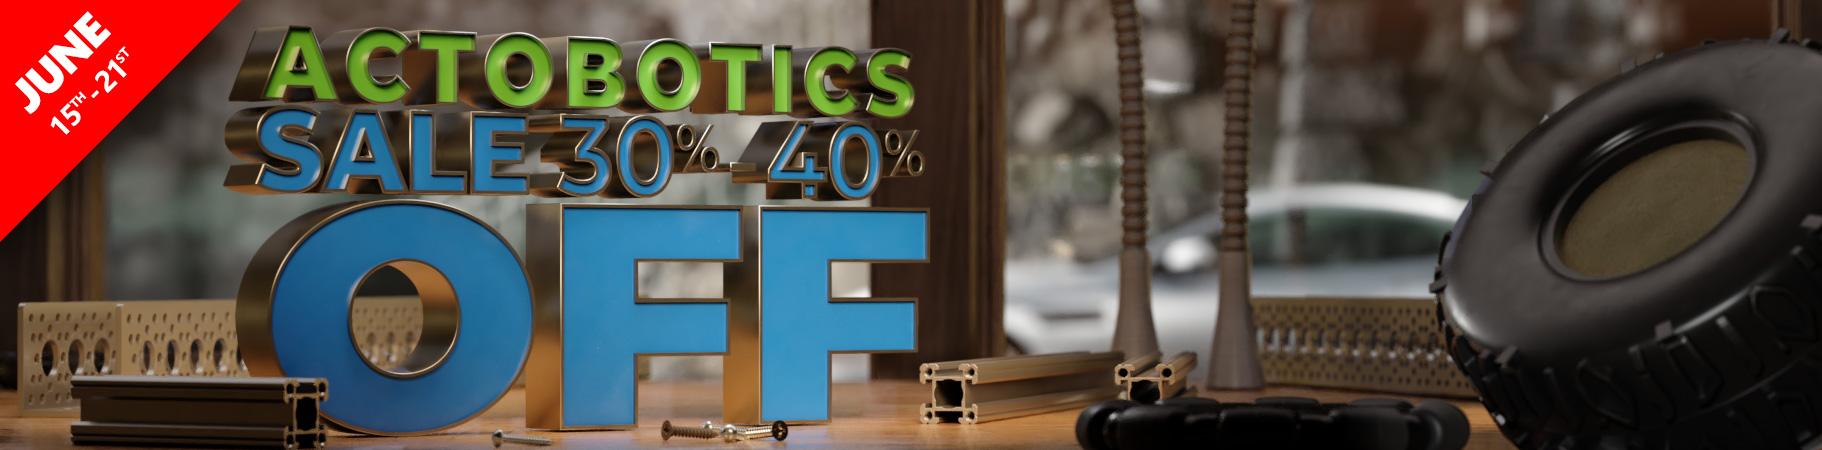 Actobotics-Sale-1822x450_02.jpg